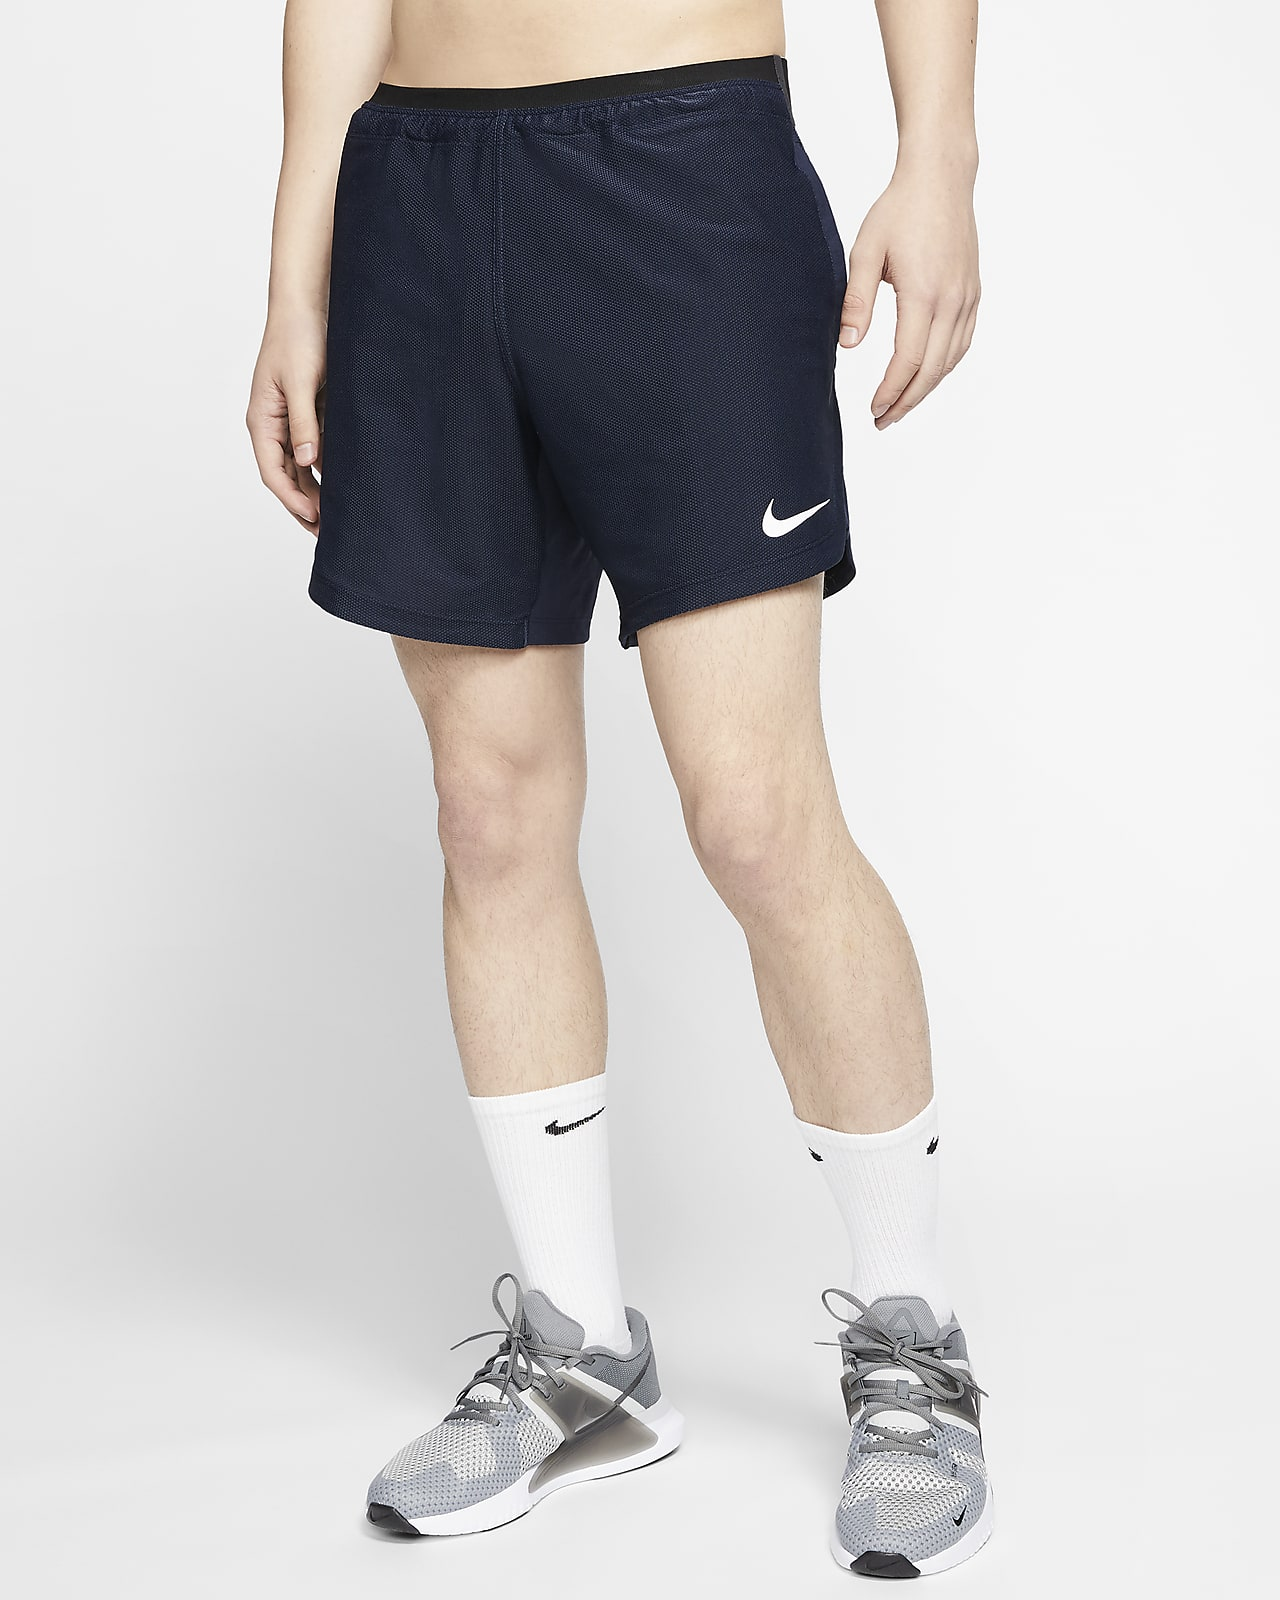 Nike Pro Erkek Şortu